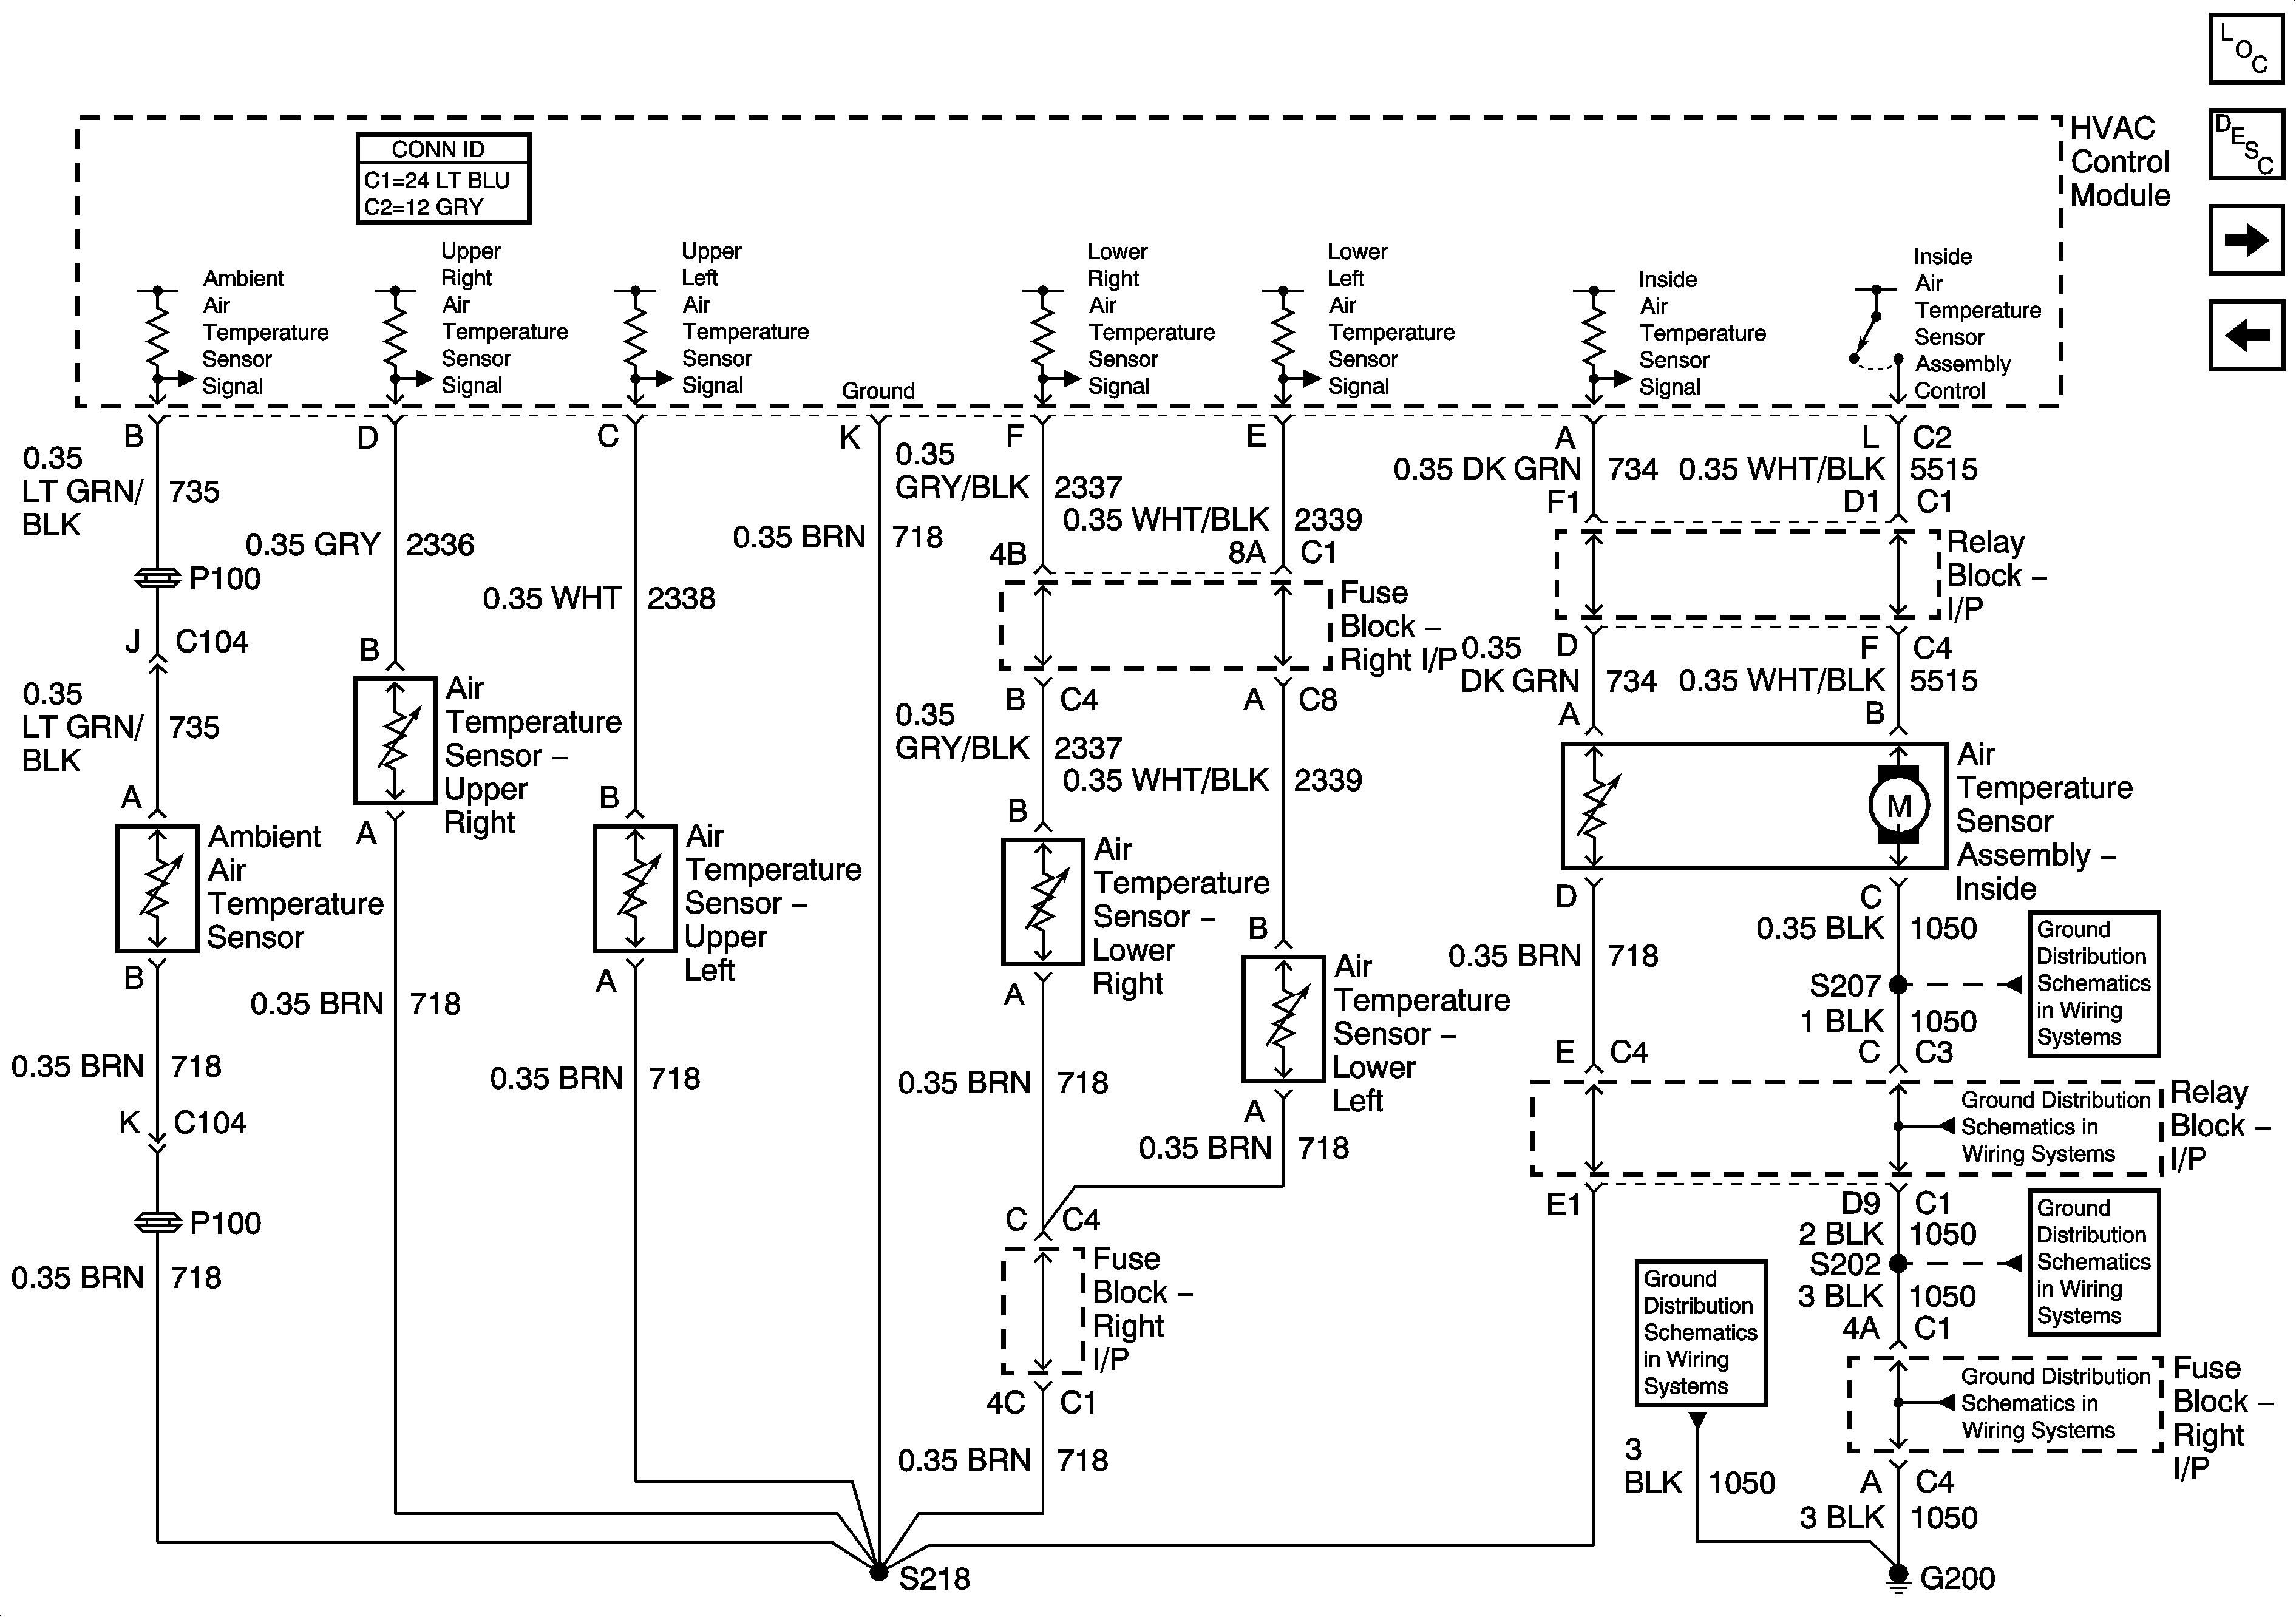 2002 Trailblazer Radio Wiring Diagram Gg 8259] 2004 Chevrolet Trailblazer Radio Wiring Diagram Of 2002 Trailblazer Radio Wiring Diagram